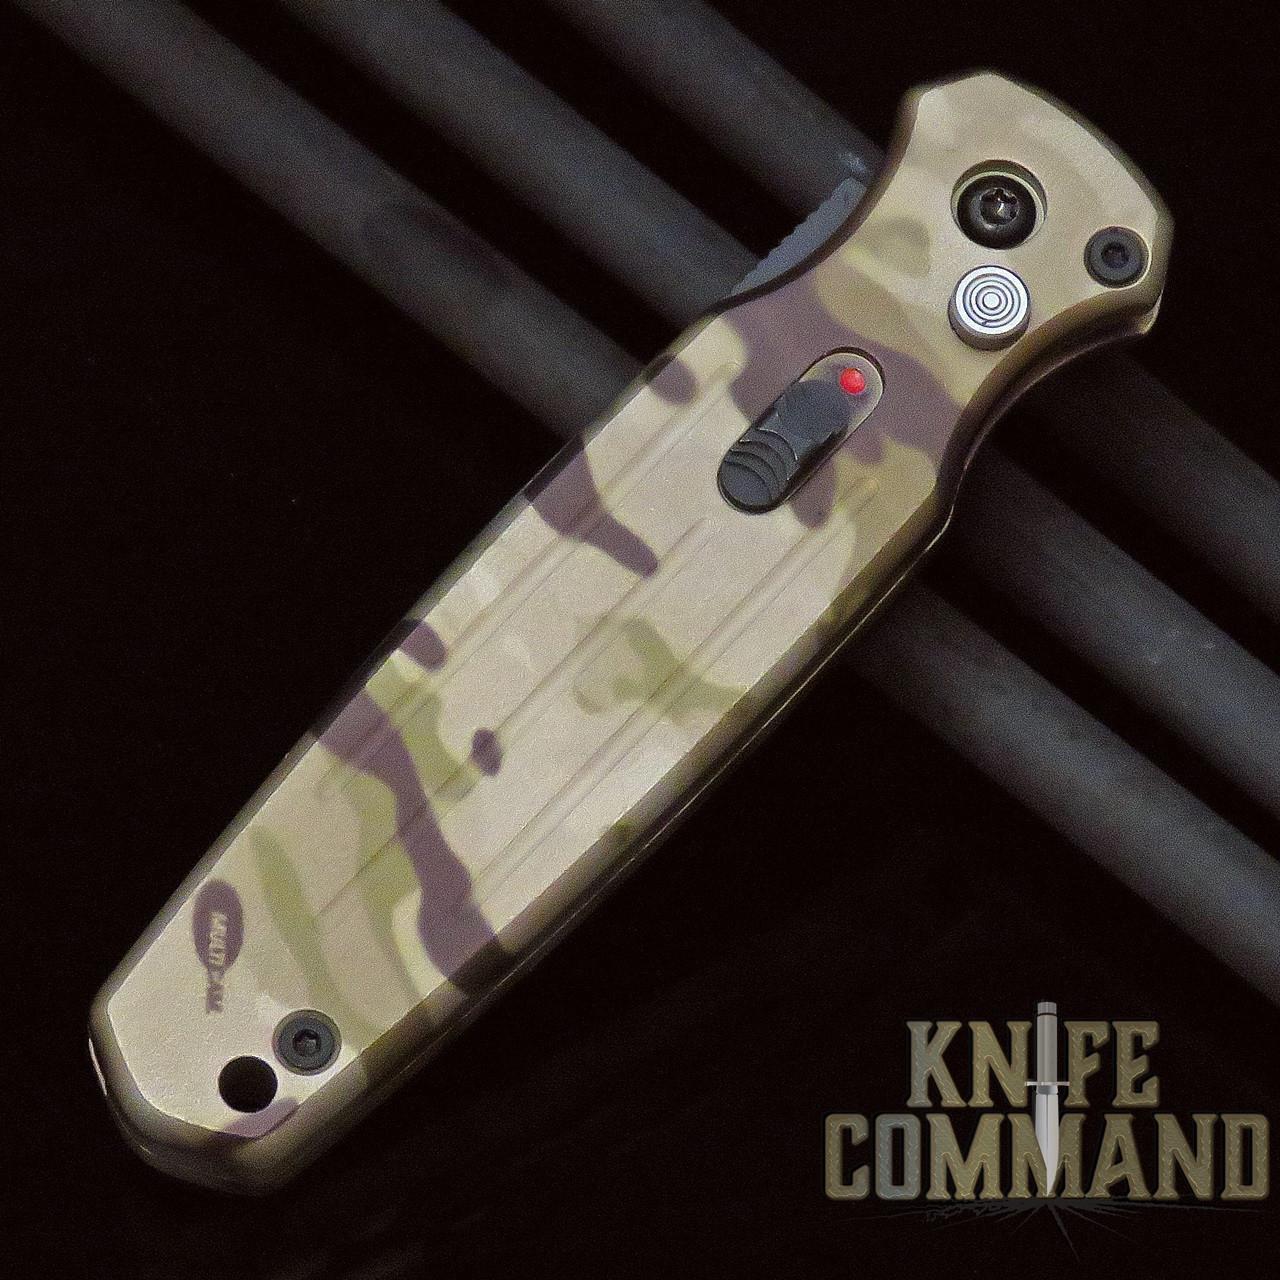 Gerber Mini Covert Automatic Knife, MultiCam® ARID™ Camo, Black CPM-S30V, 30-001620